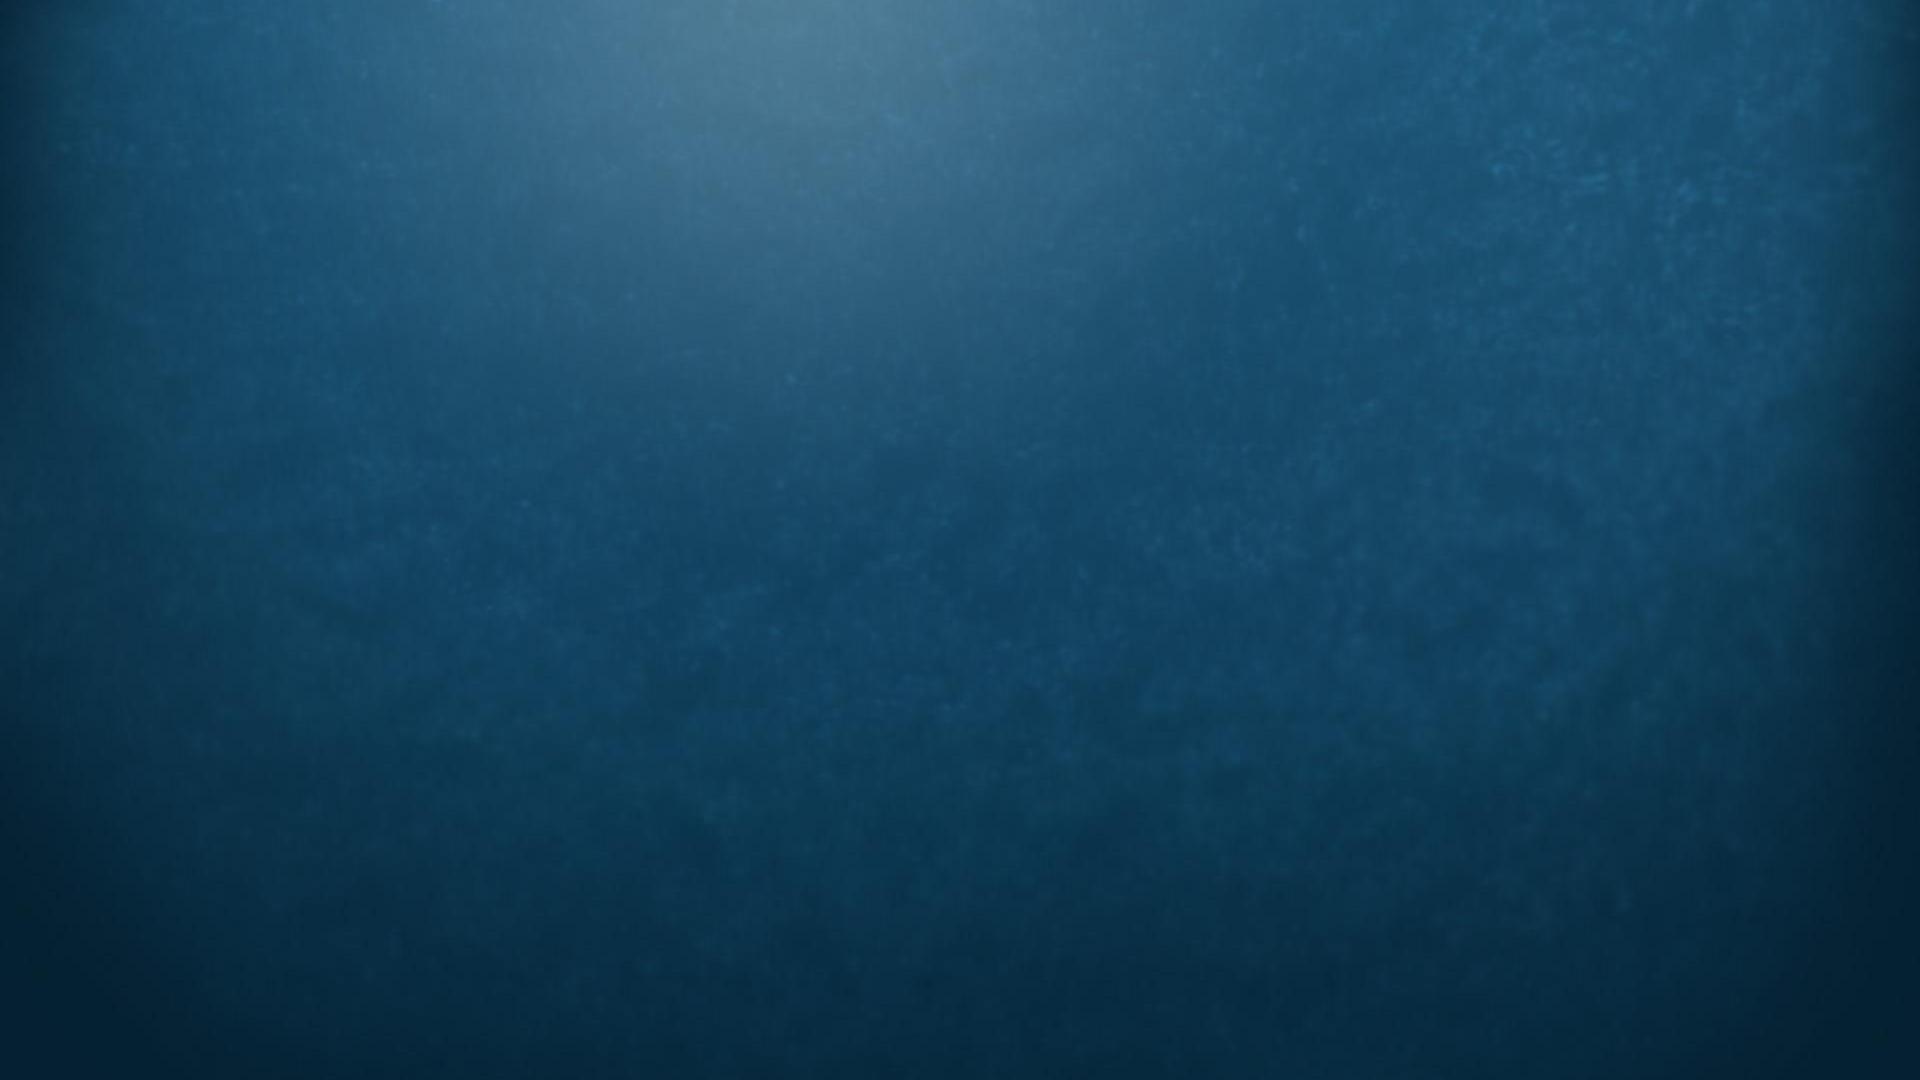 Plain Blue Wallpaper, wallpaper, Plain Blue Wallpaper hd wallpaper .